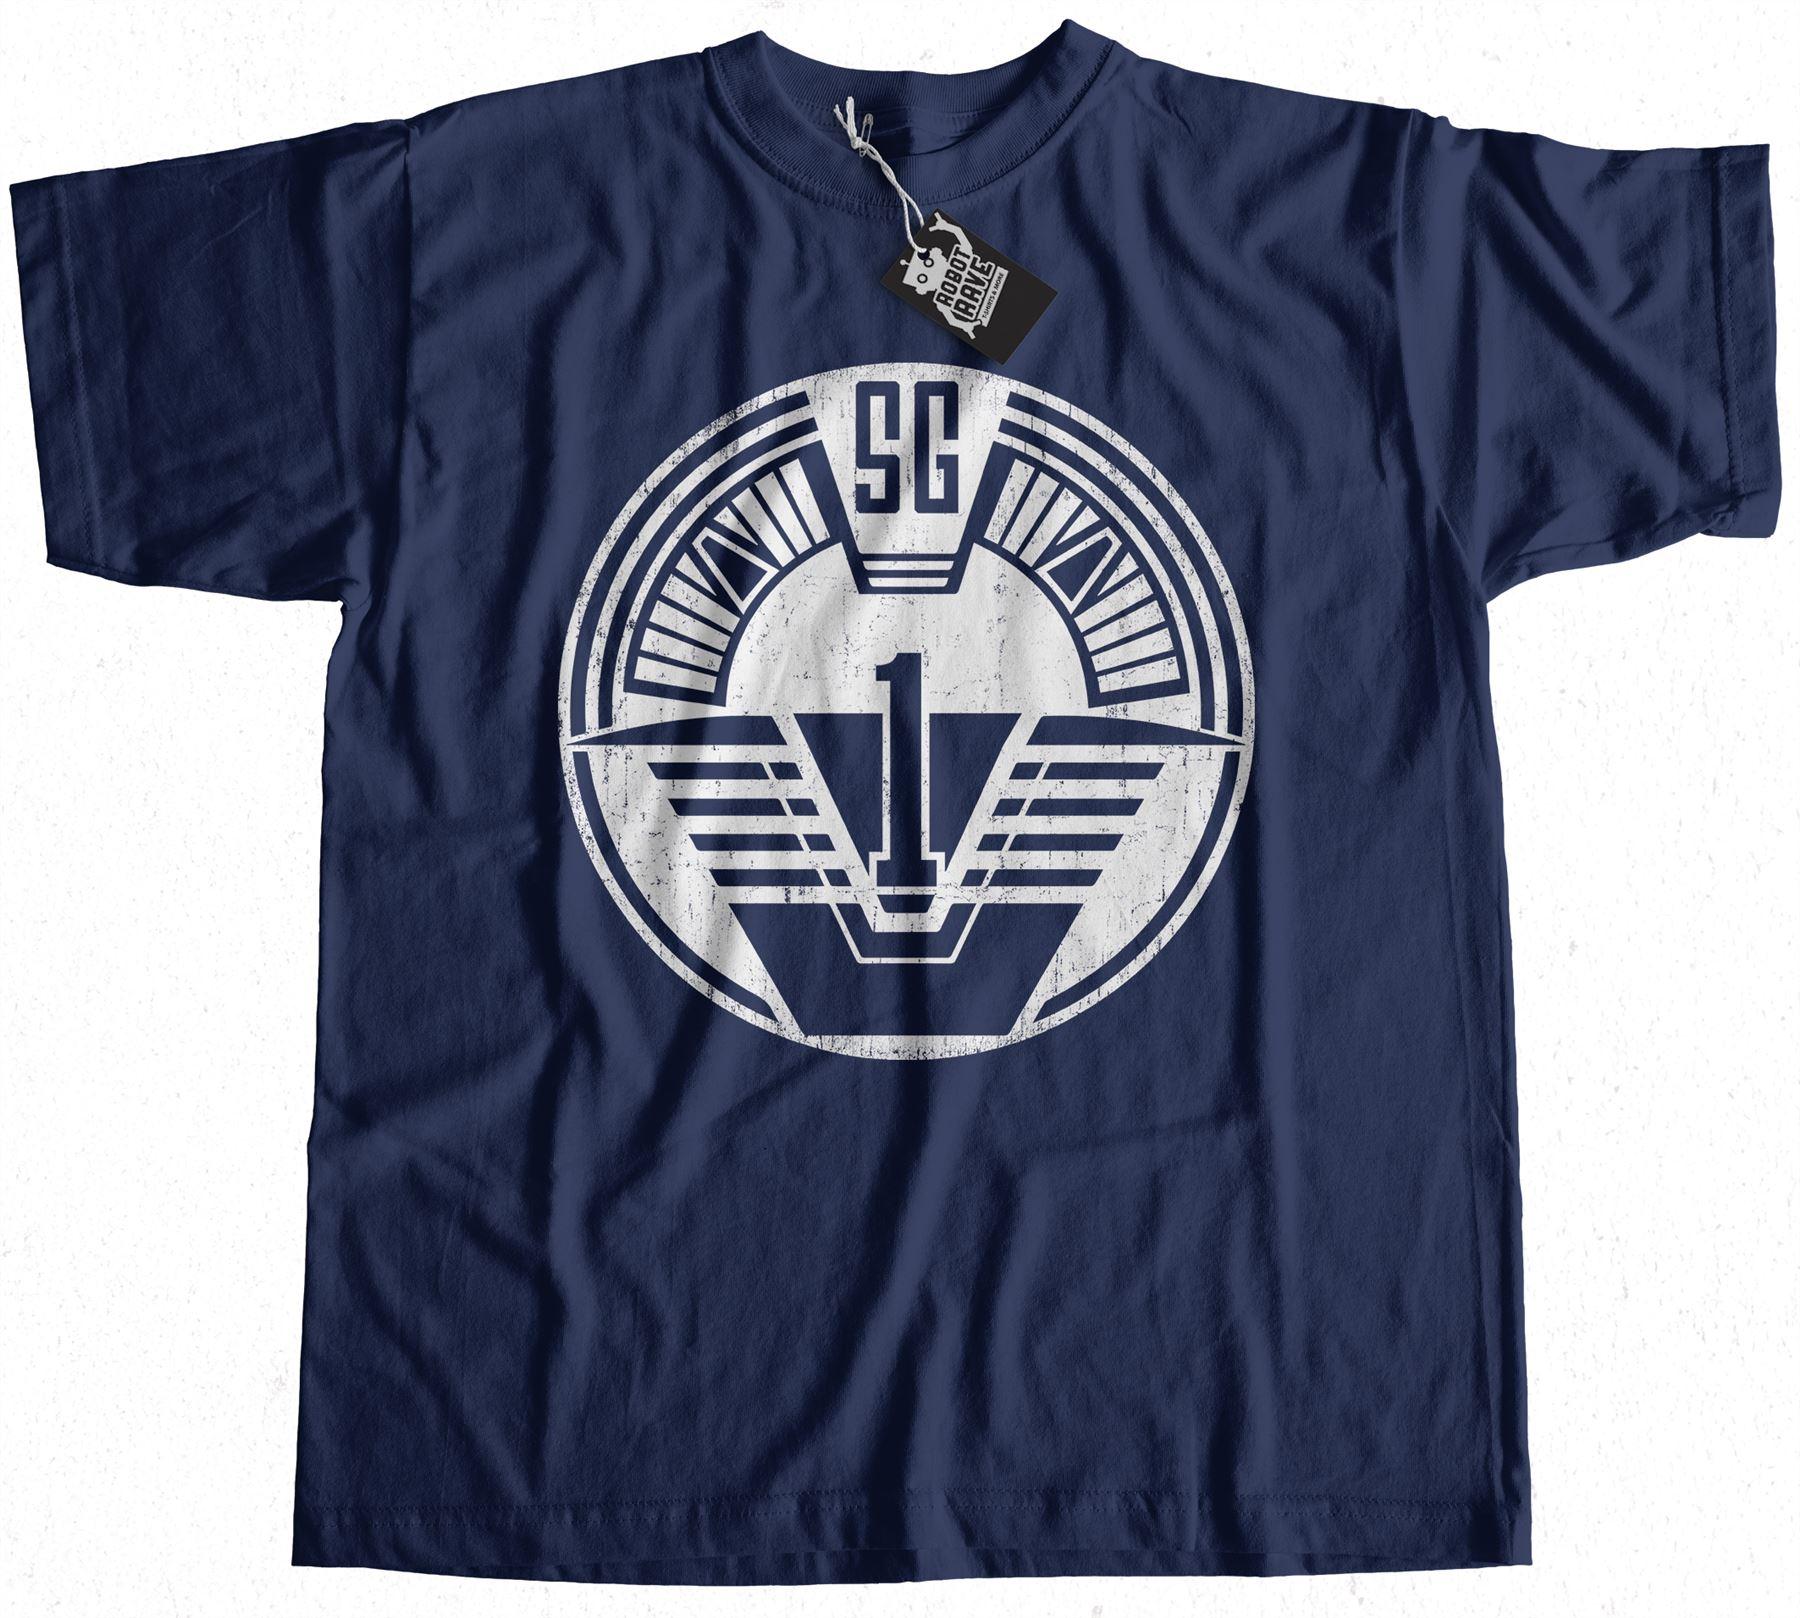 SG1-T-Shirt-100-Premium-Cotton Indexbild 15